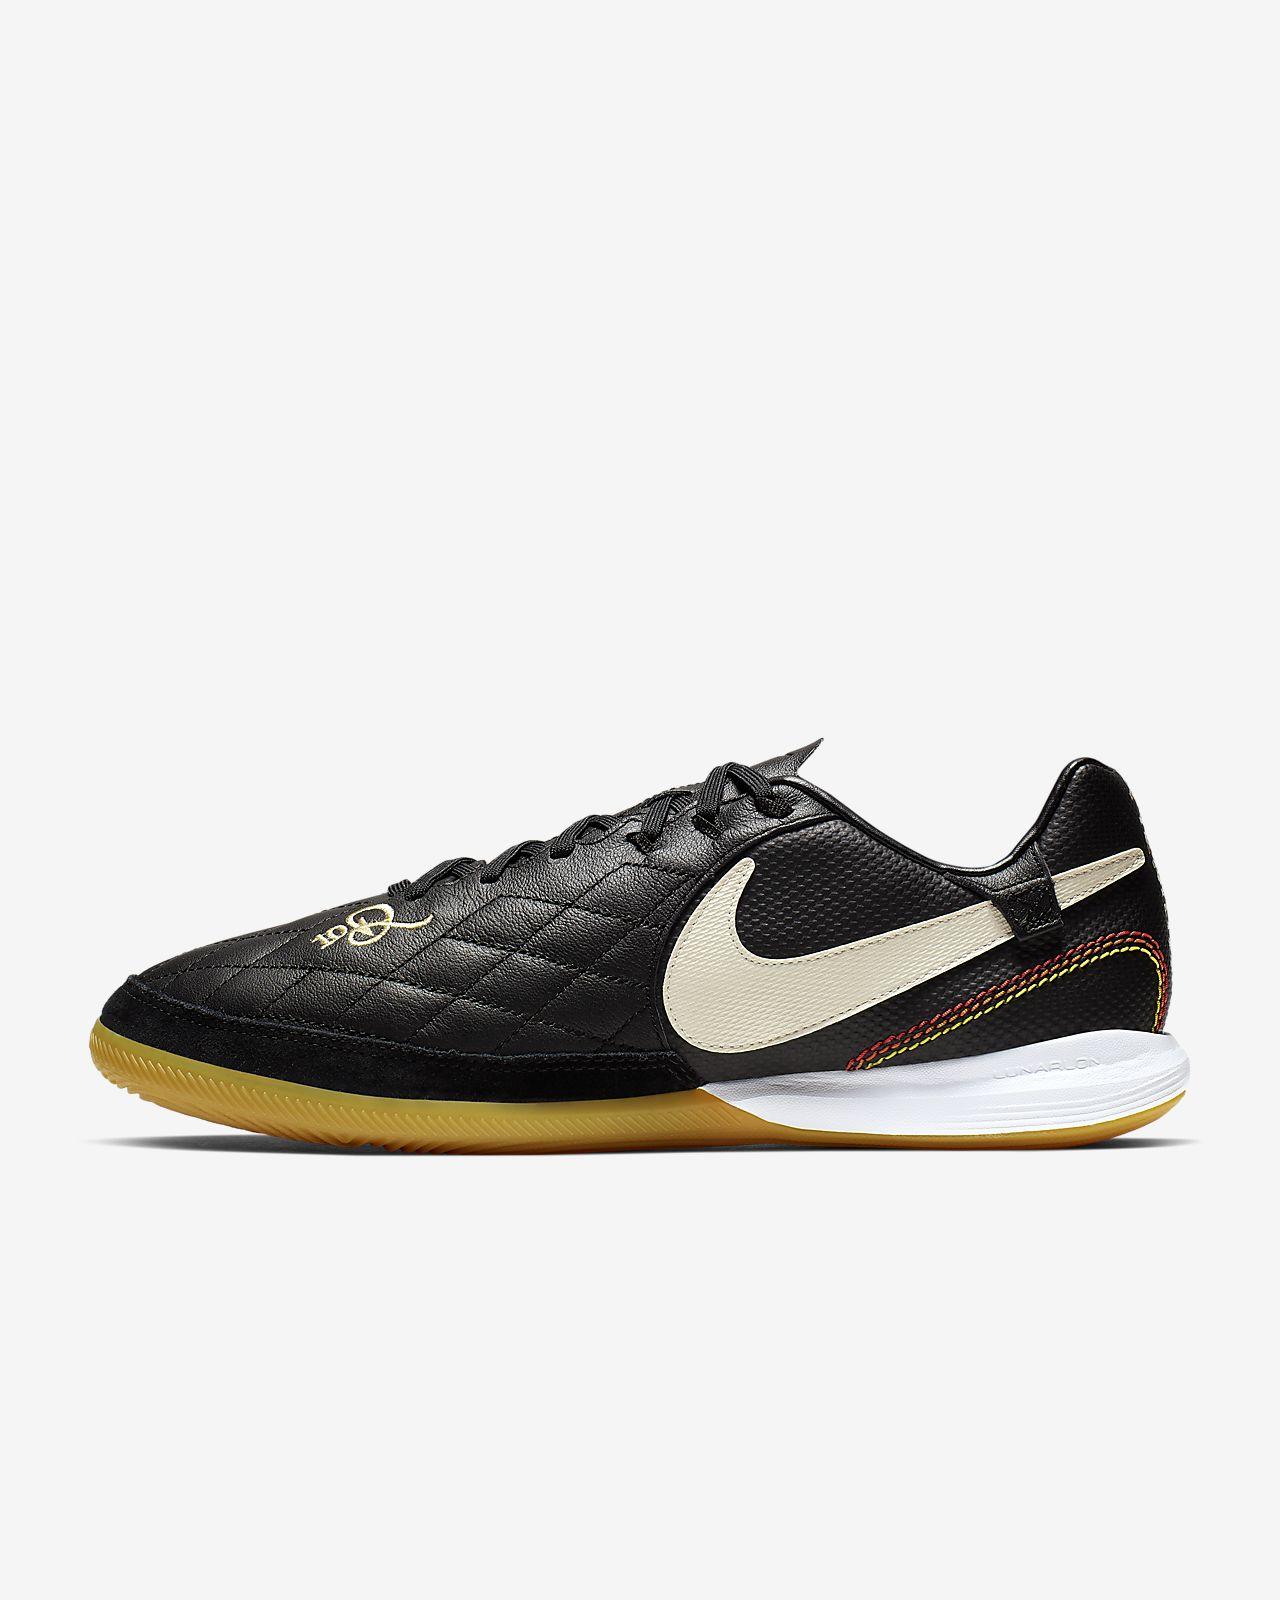 38343d08e Nike TiempoX Lunar Legend VII Pro 10R Indoor Court Football Shoe ...